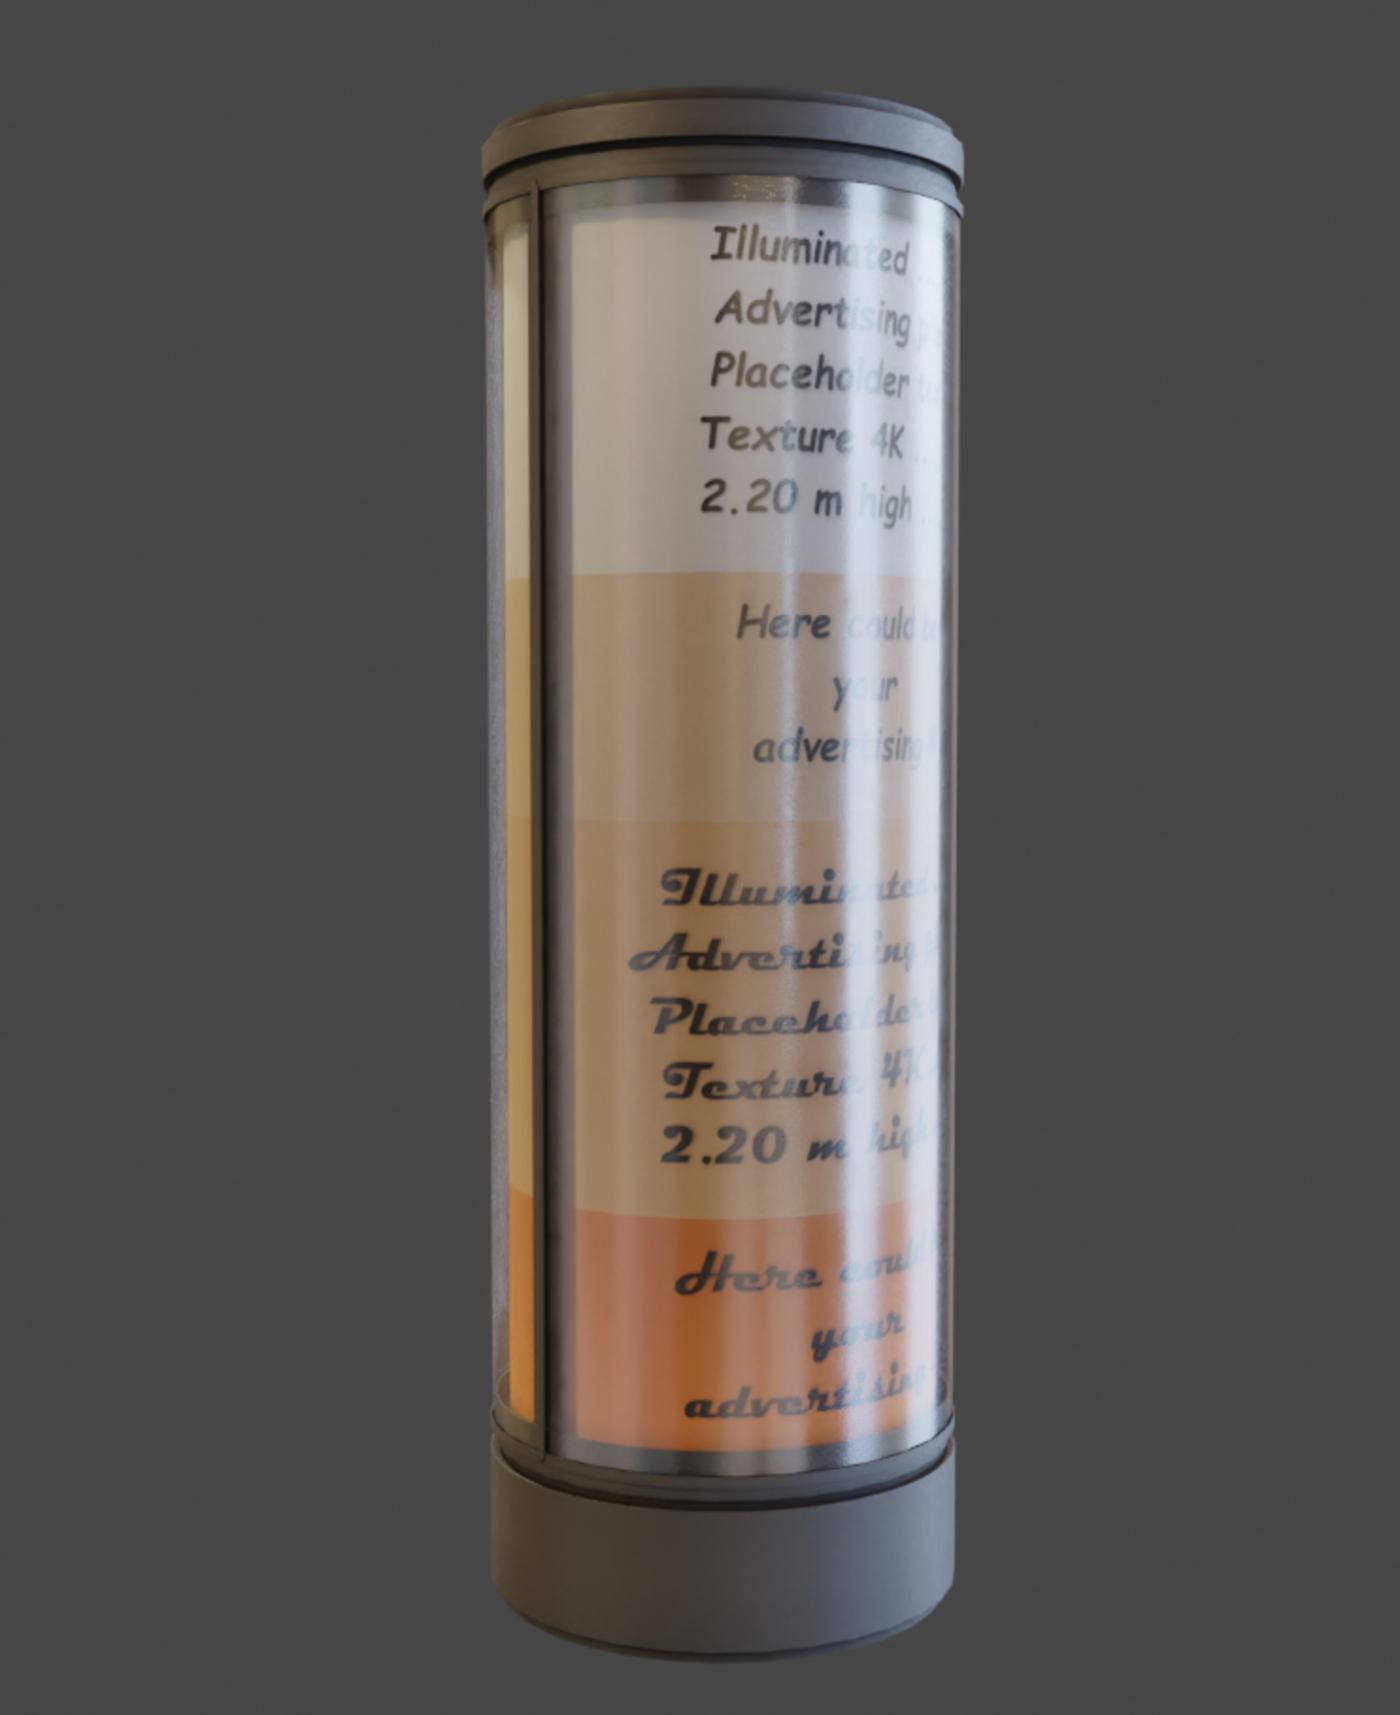 Modern Illuminated Advertising Pillars (Blender-2-90-1 Eevee)